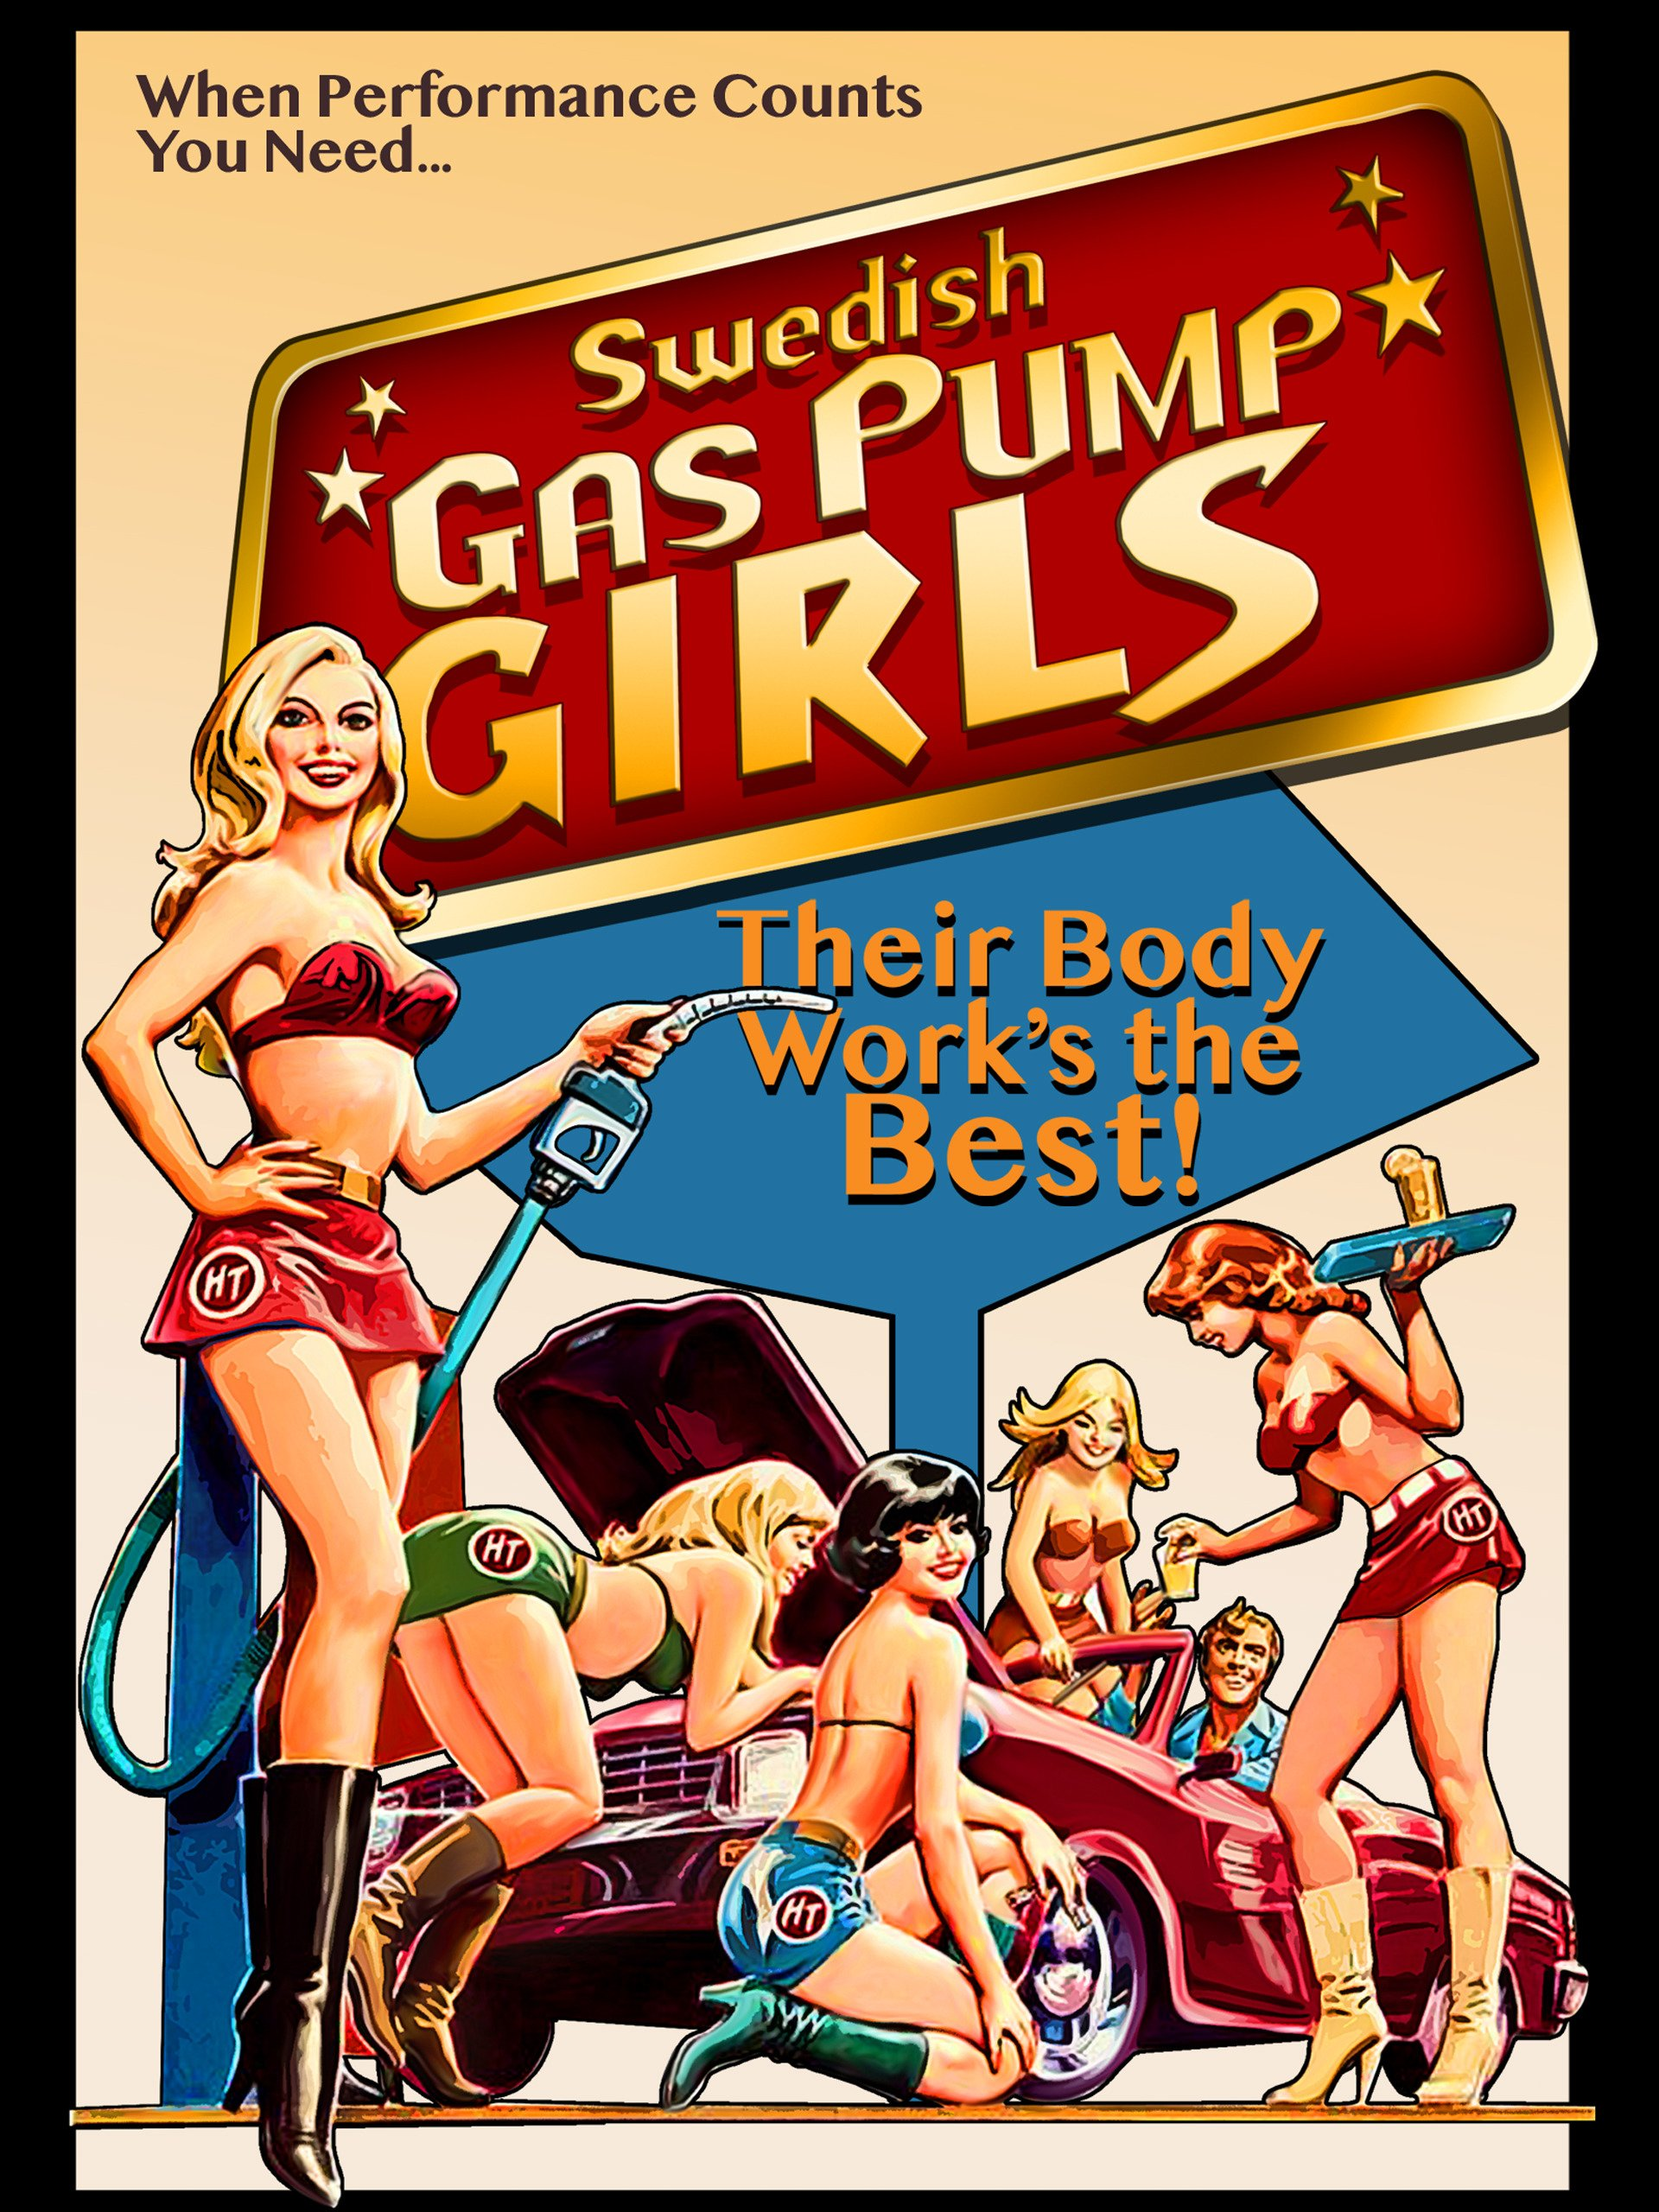 Swedish Gas Pump Girls